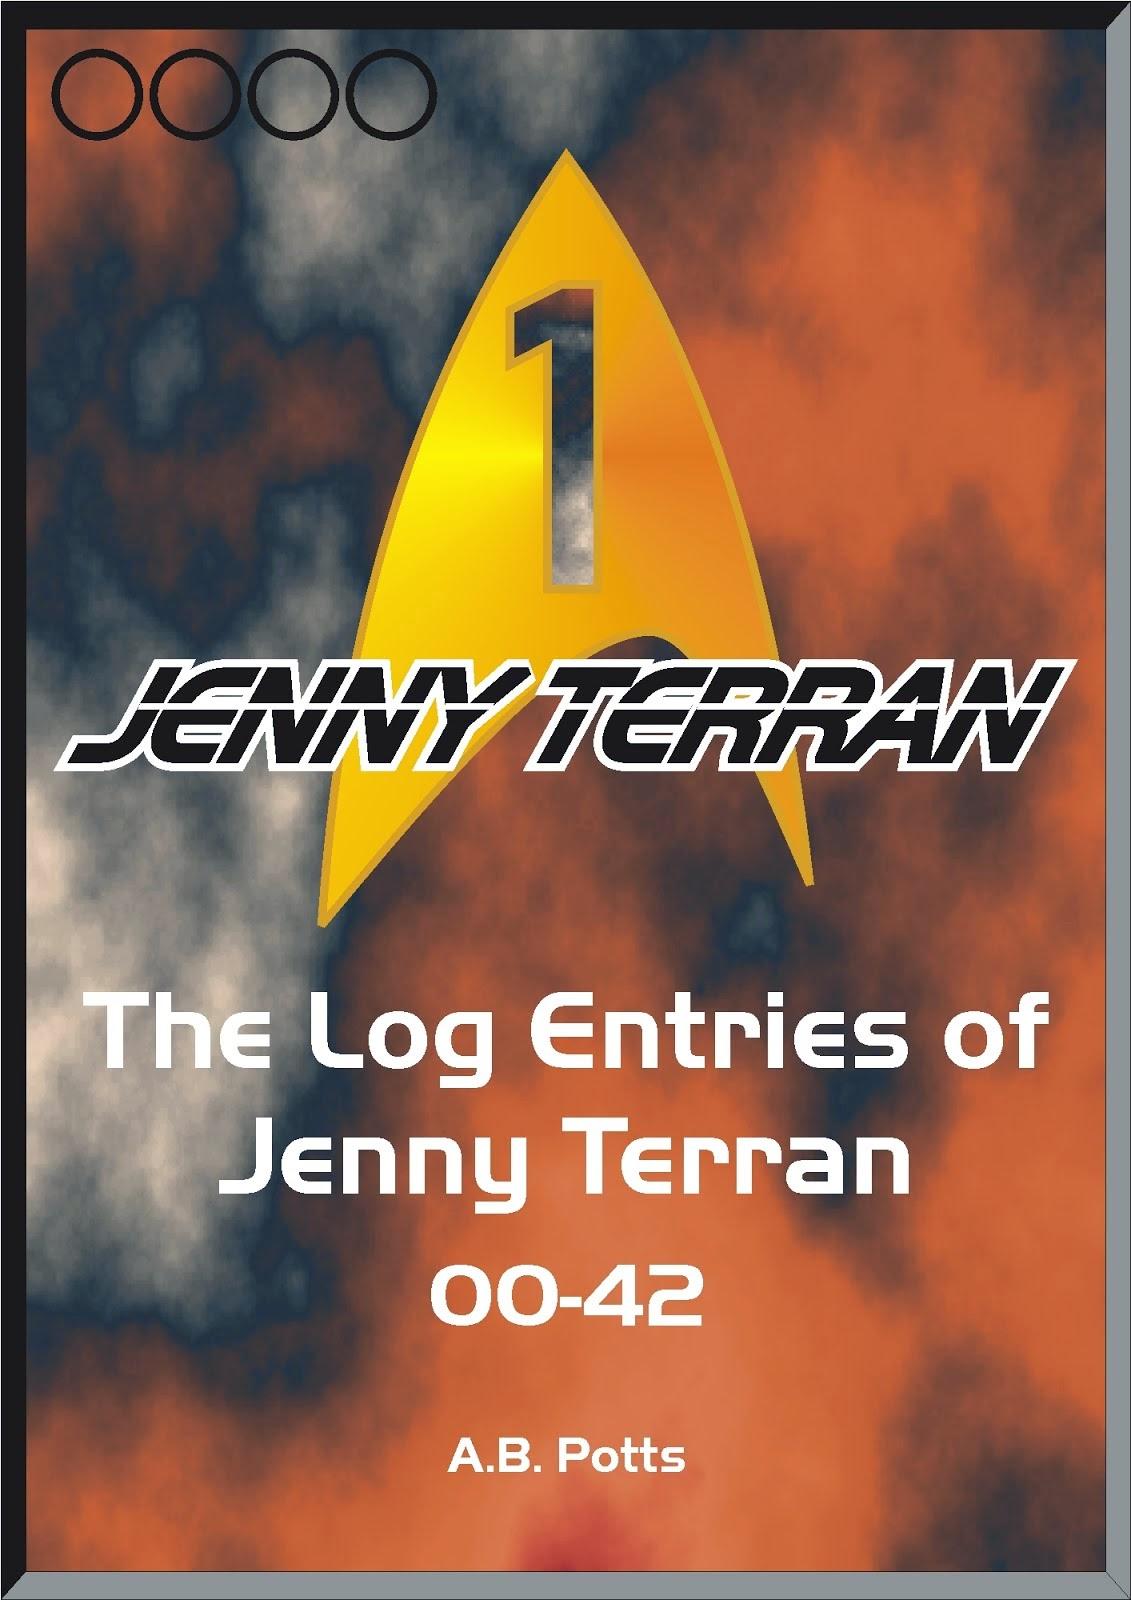 Meet Jenny Terran ...